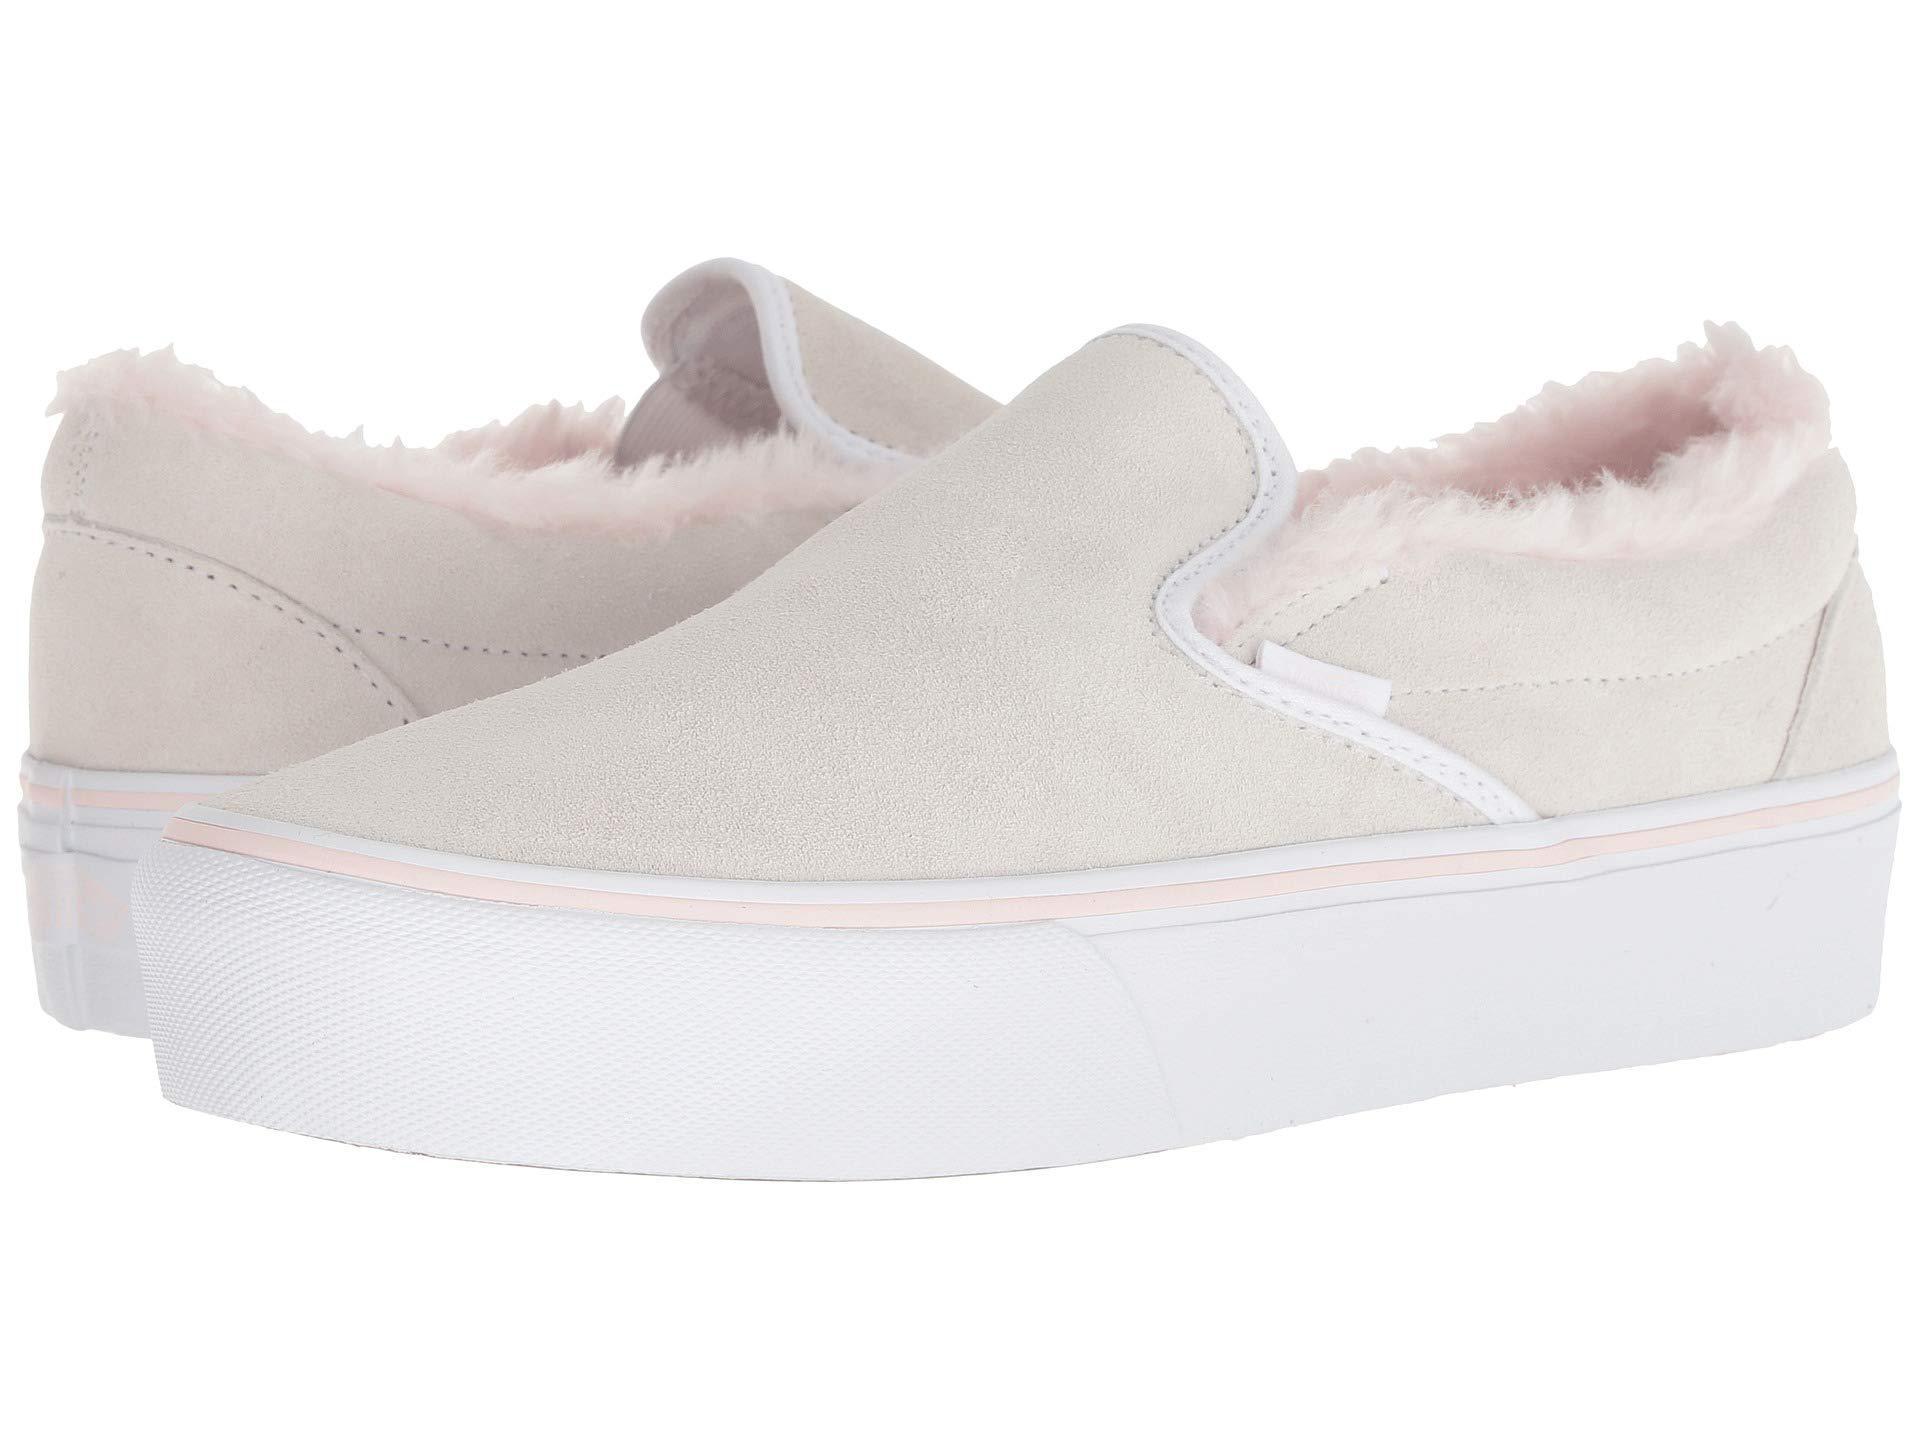 Lyst - Vans Women Classic Slip-on Platform Suede Sneakers 5e9f4335b